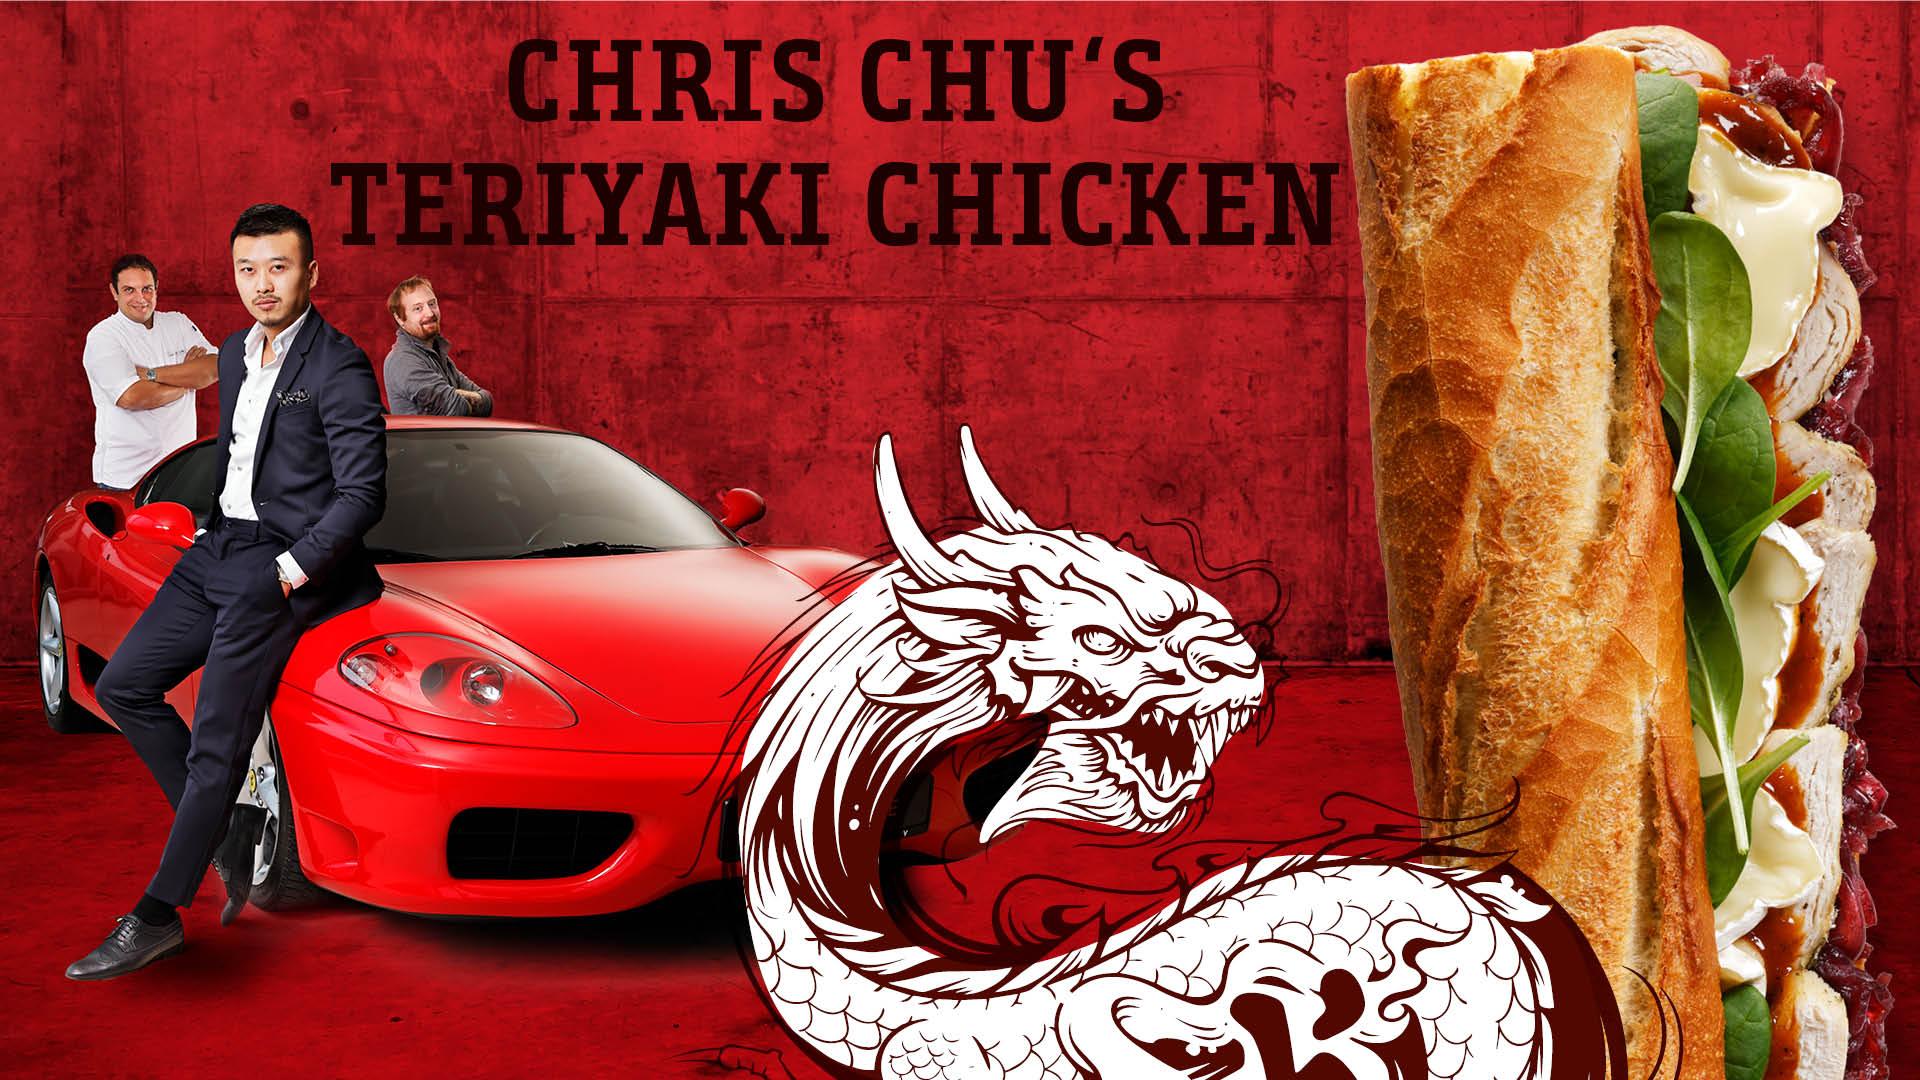 Chris Chu's teriyaki chicken